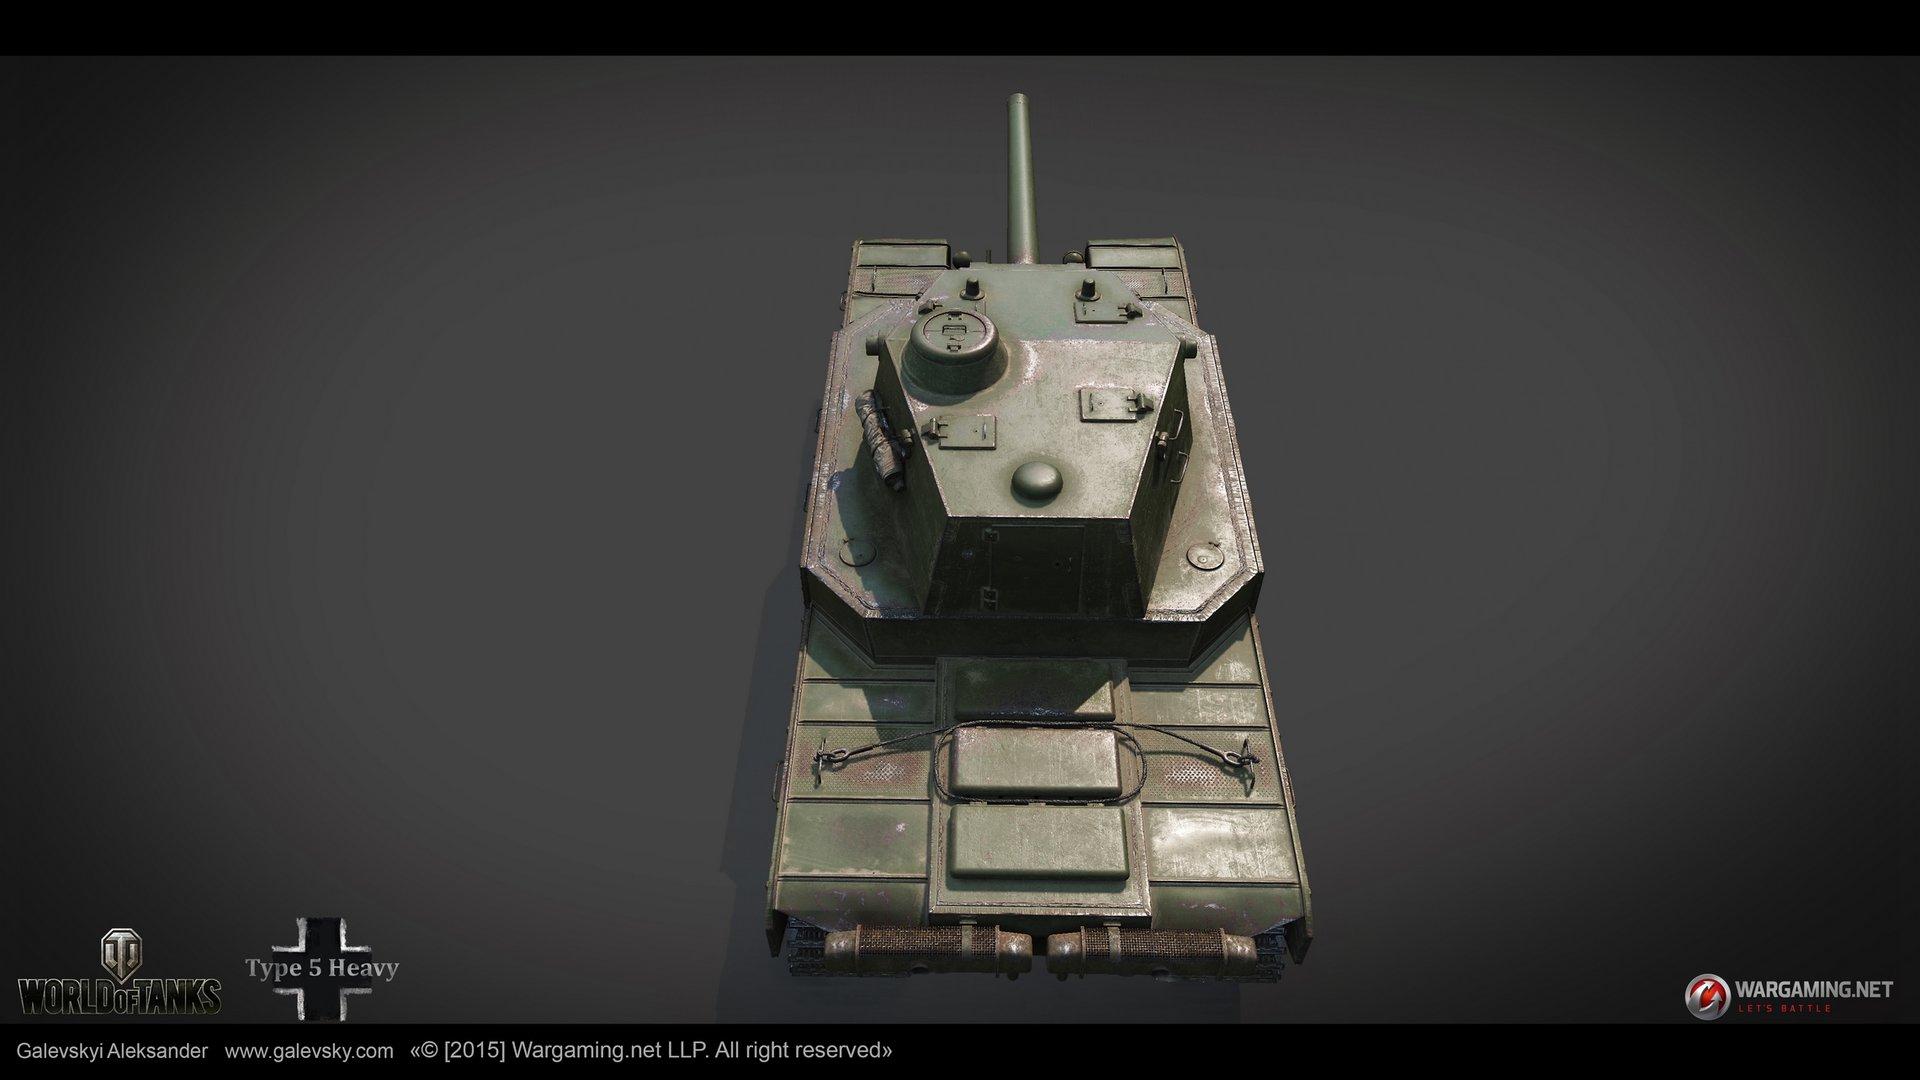 Aleksander galevskyi type 2605 fin 06 med